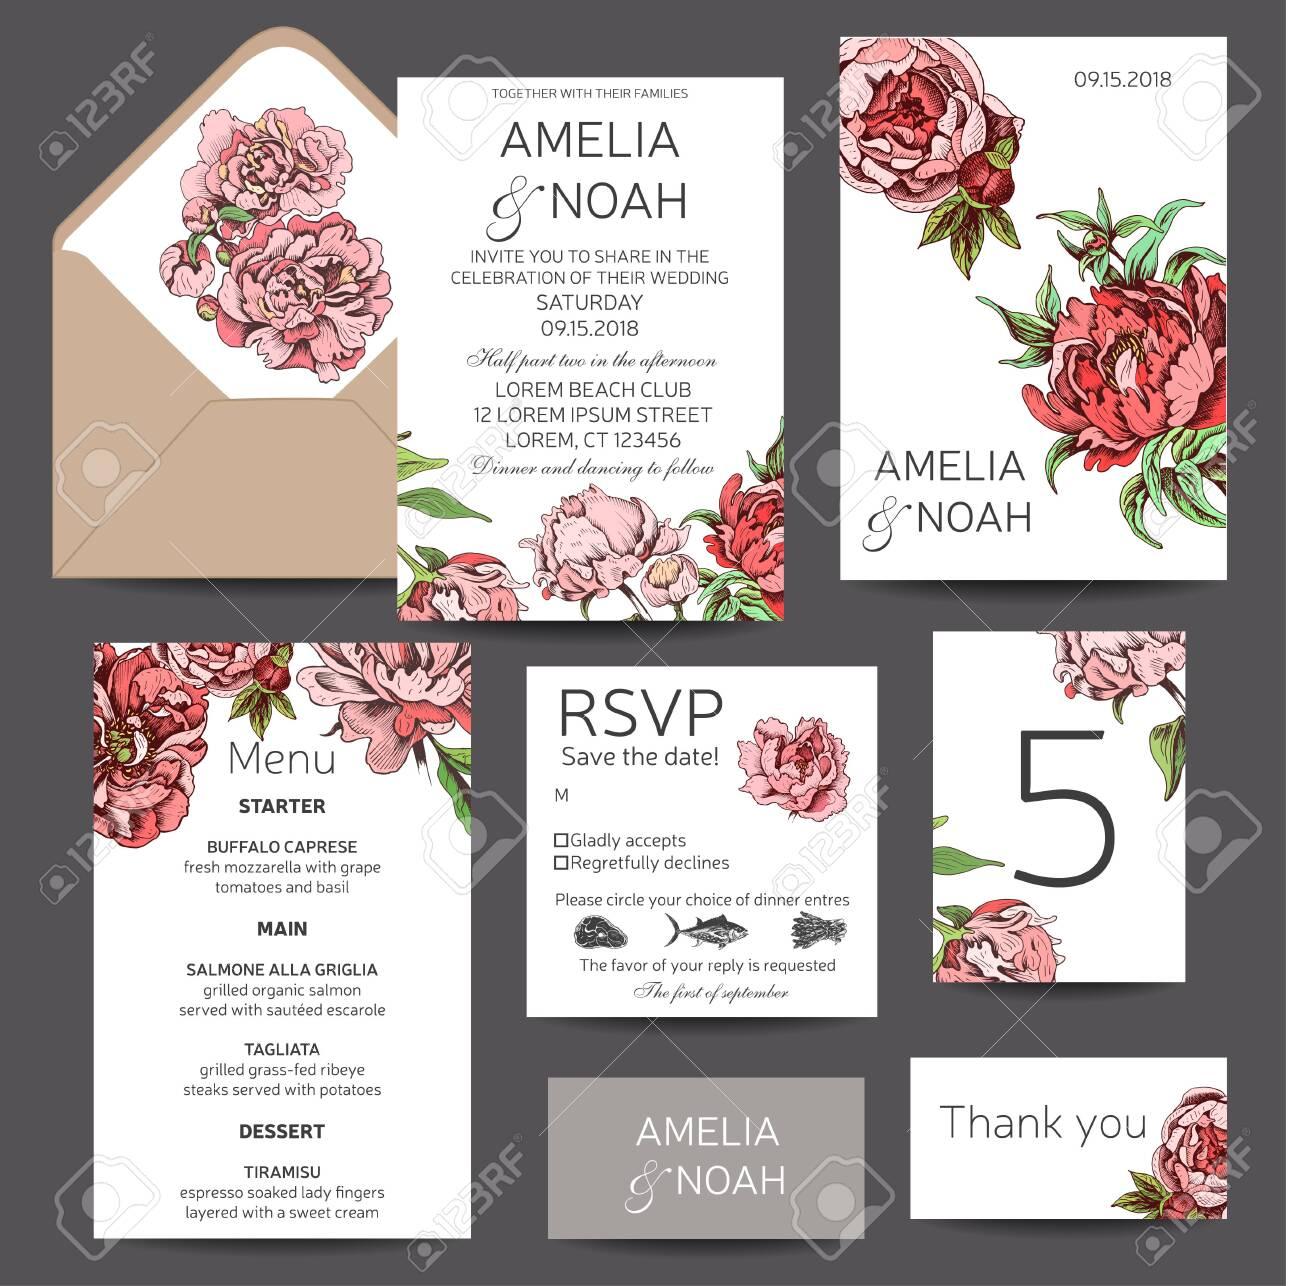 Vector illustration sketch - card with flowers chrysanthemum, peony. Wedding invitation with flower. Dahlias, Ruscus, Viburnum. - 123613884